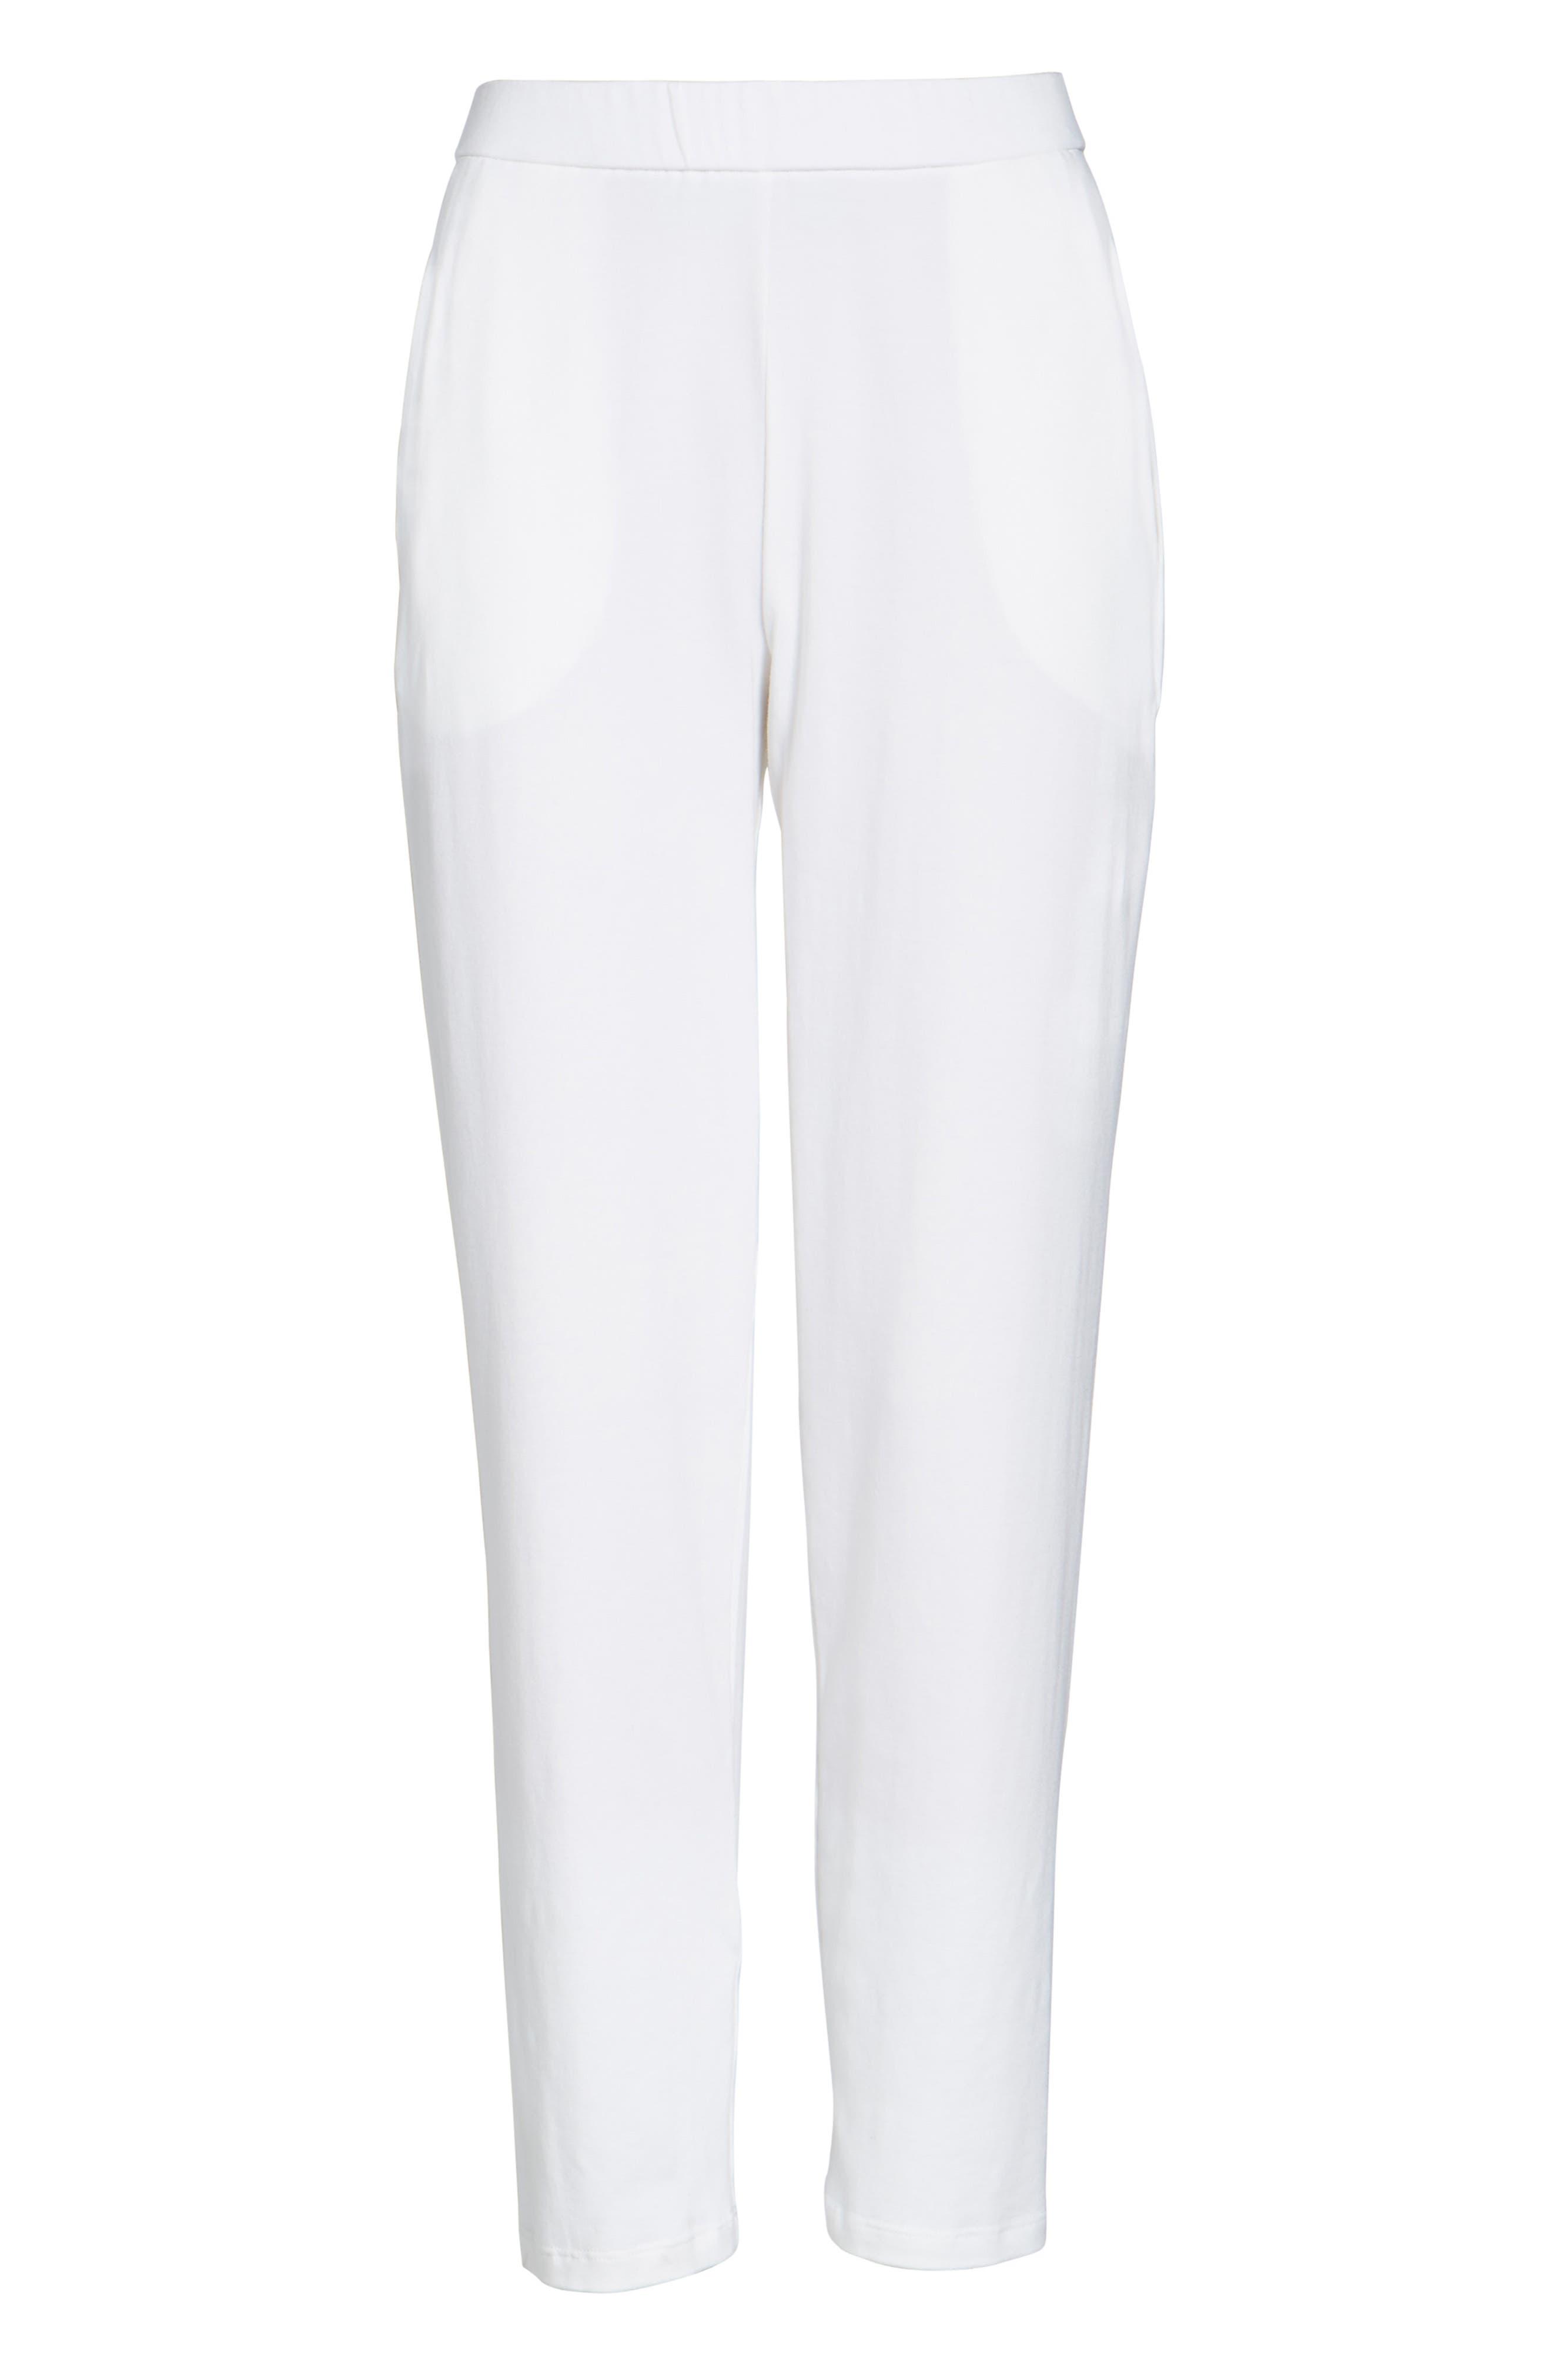 Stretch Organic Cotton Slim Slouchy Ankle Pants,                             Main thumbnail 1, color,                             White